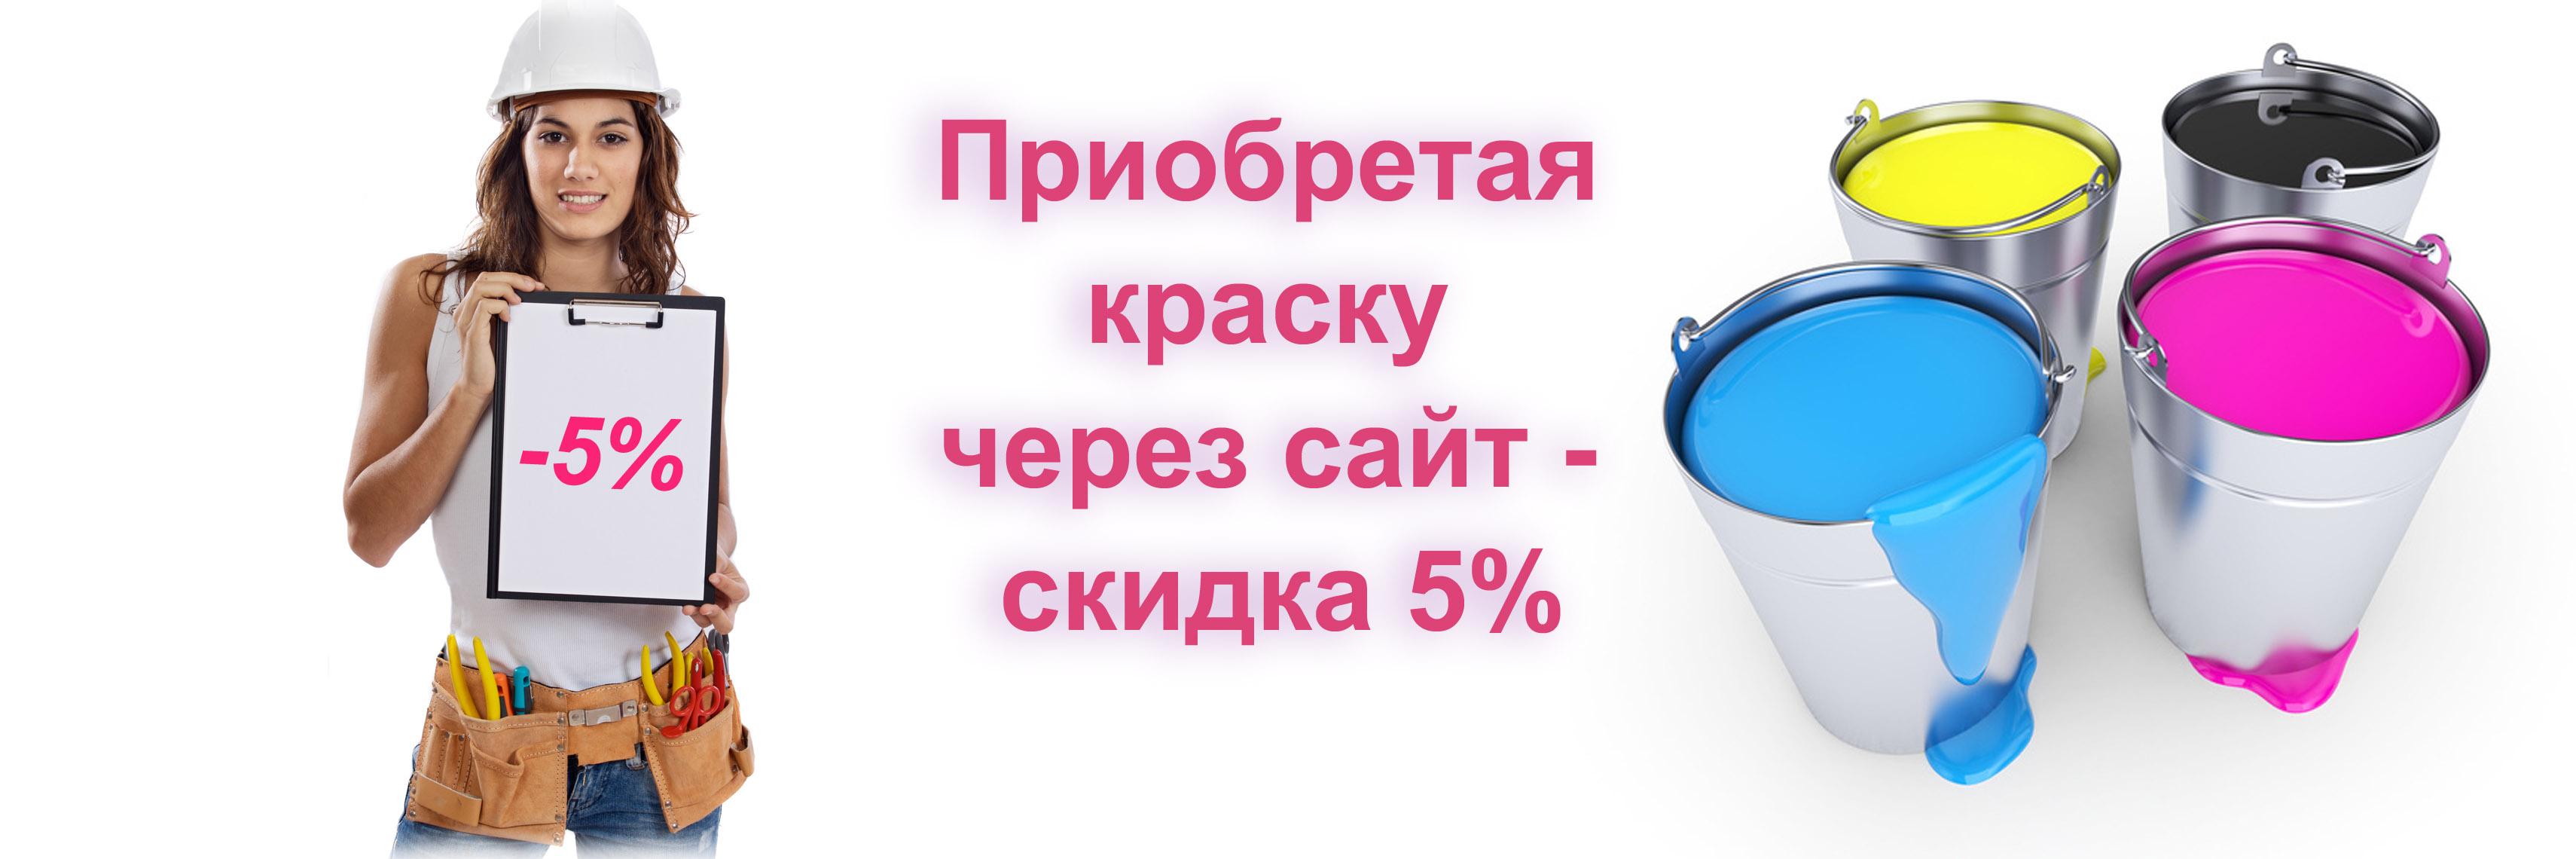 Cкидка -5% осуществляя покупки через наш сайт | ФАРБАКОЛОР